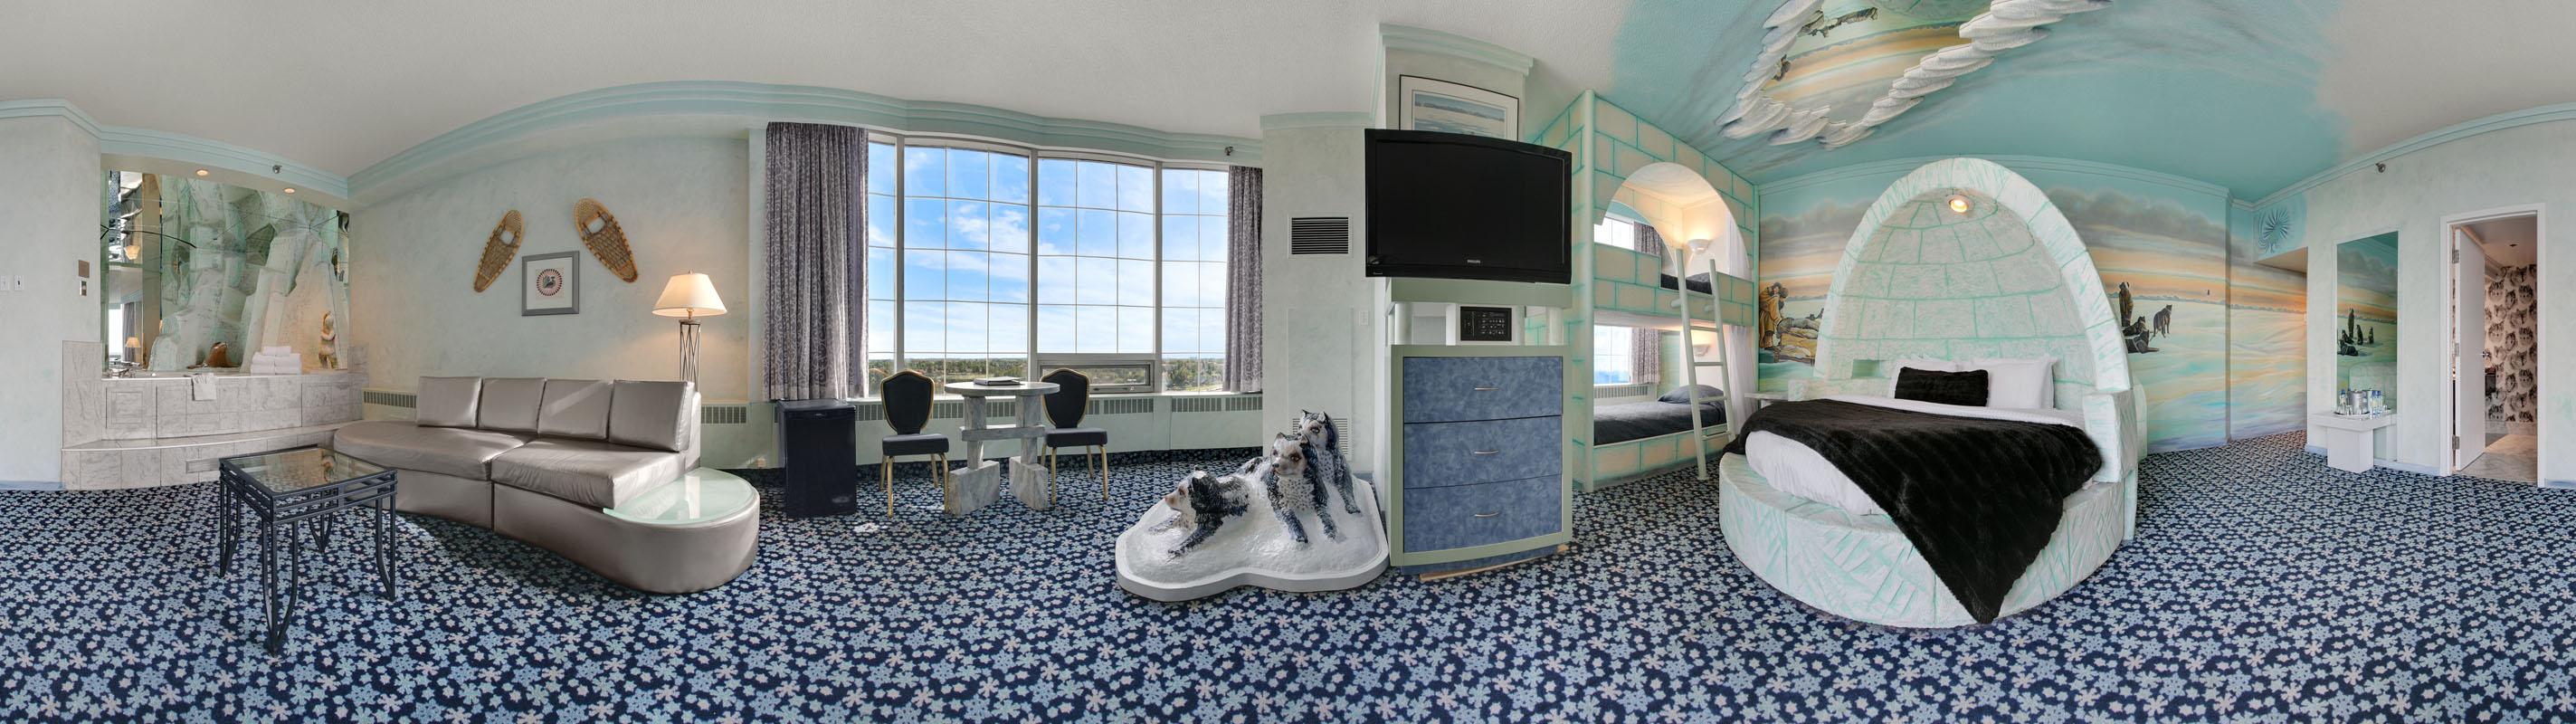 Luxury Igloo Theme Room